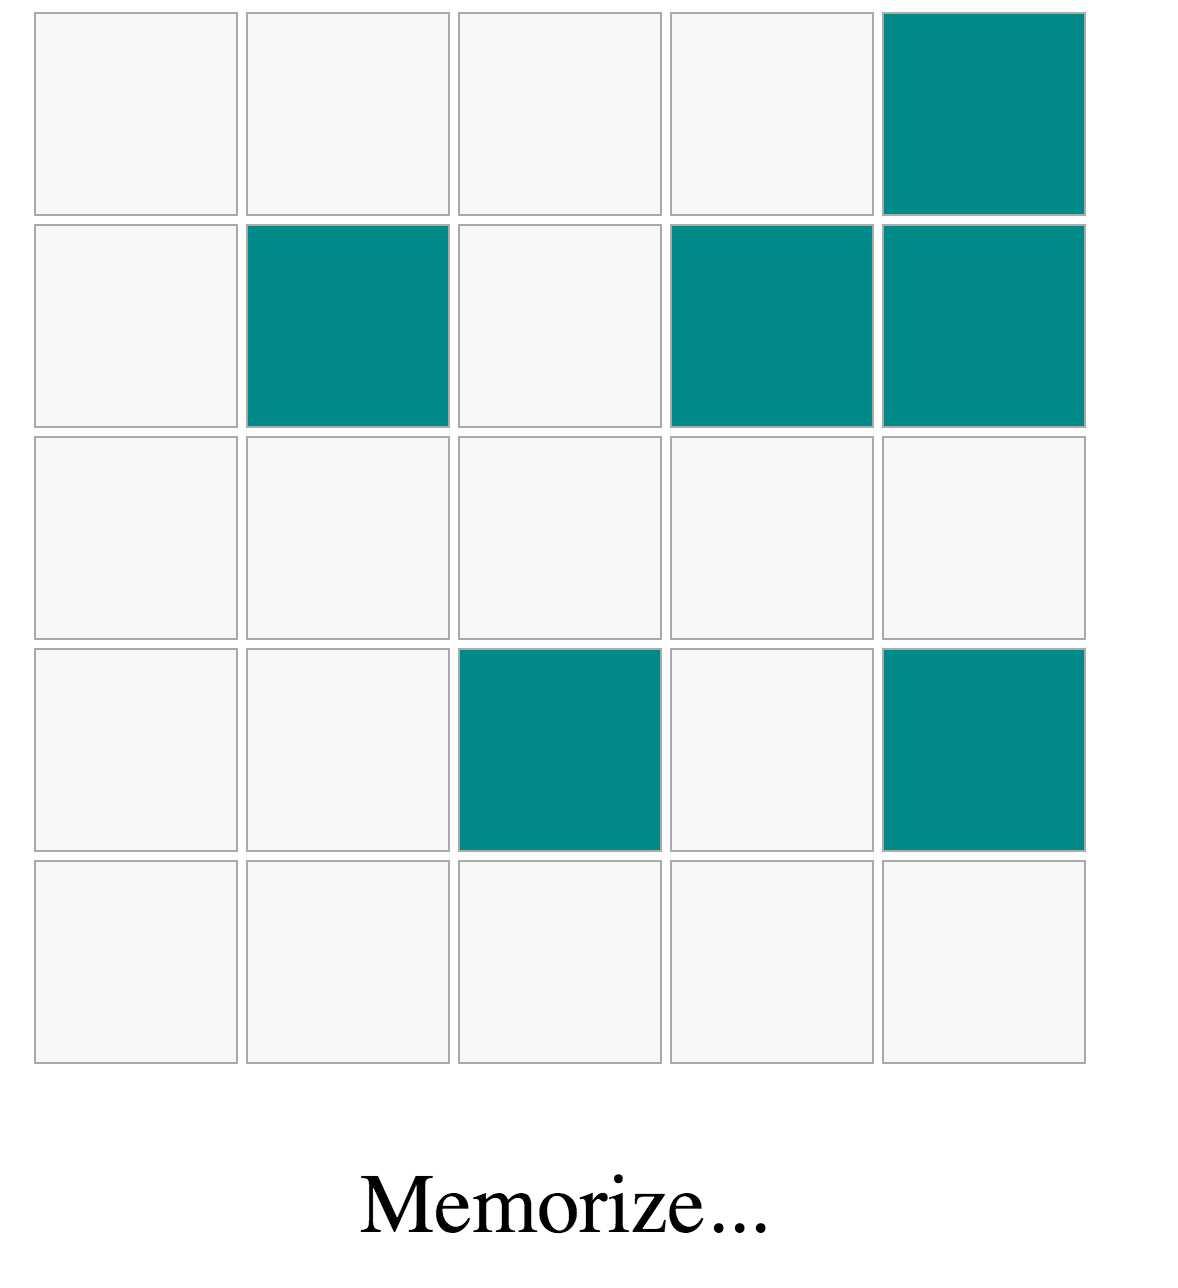 Ebook - Chapter 9 of React js